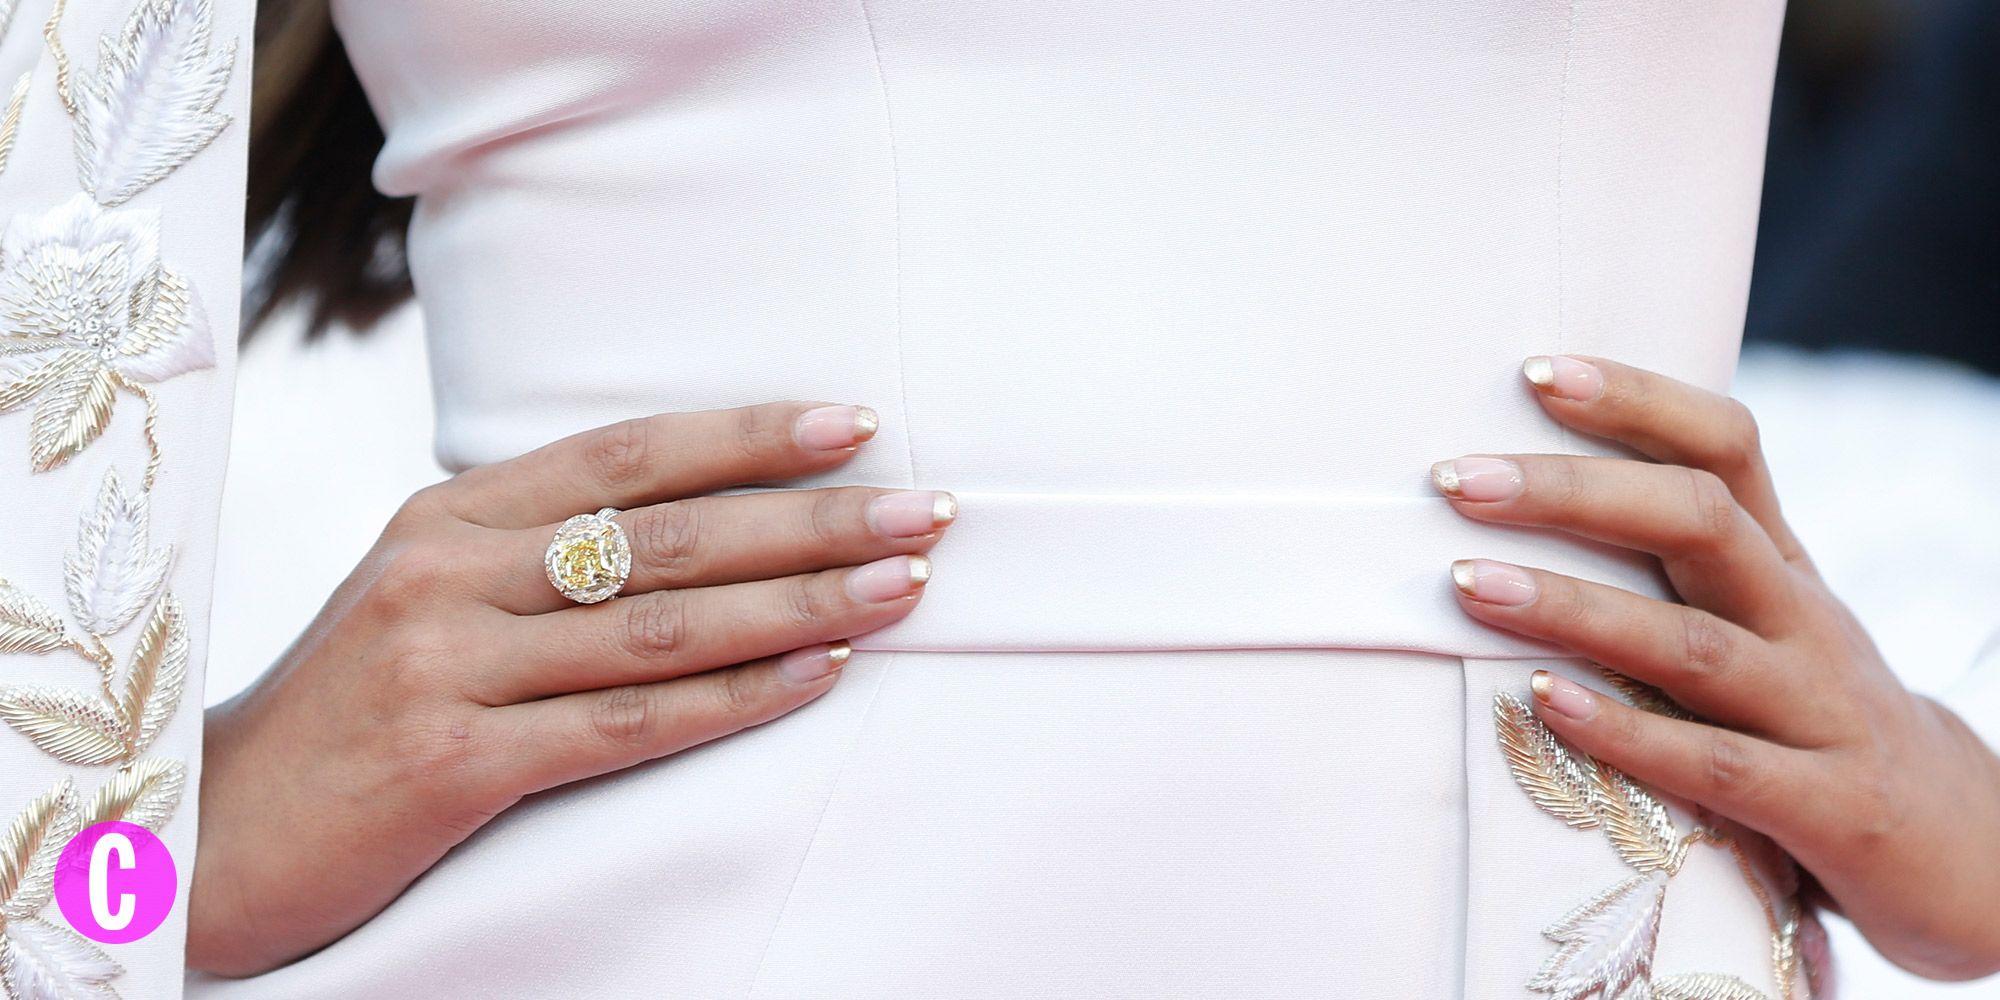 Top 4 idee per unghie con french gel bianche e colorate PW58